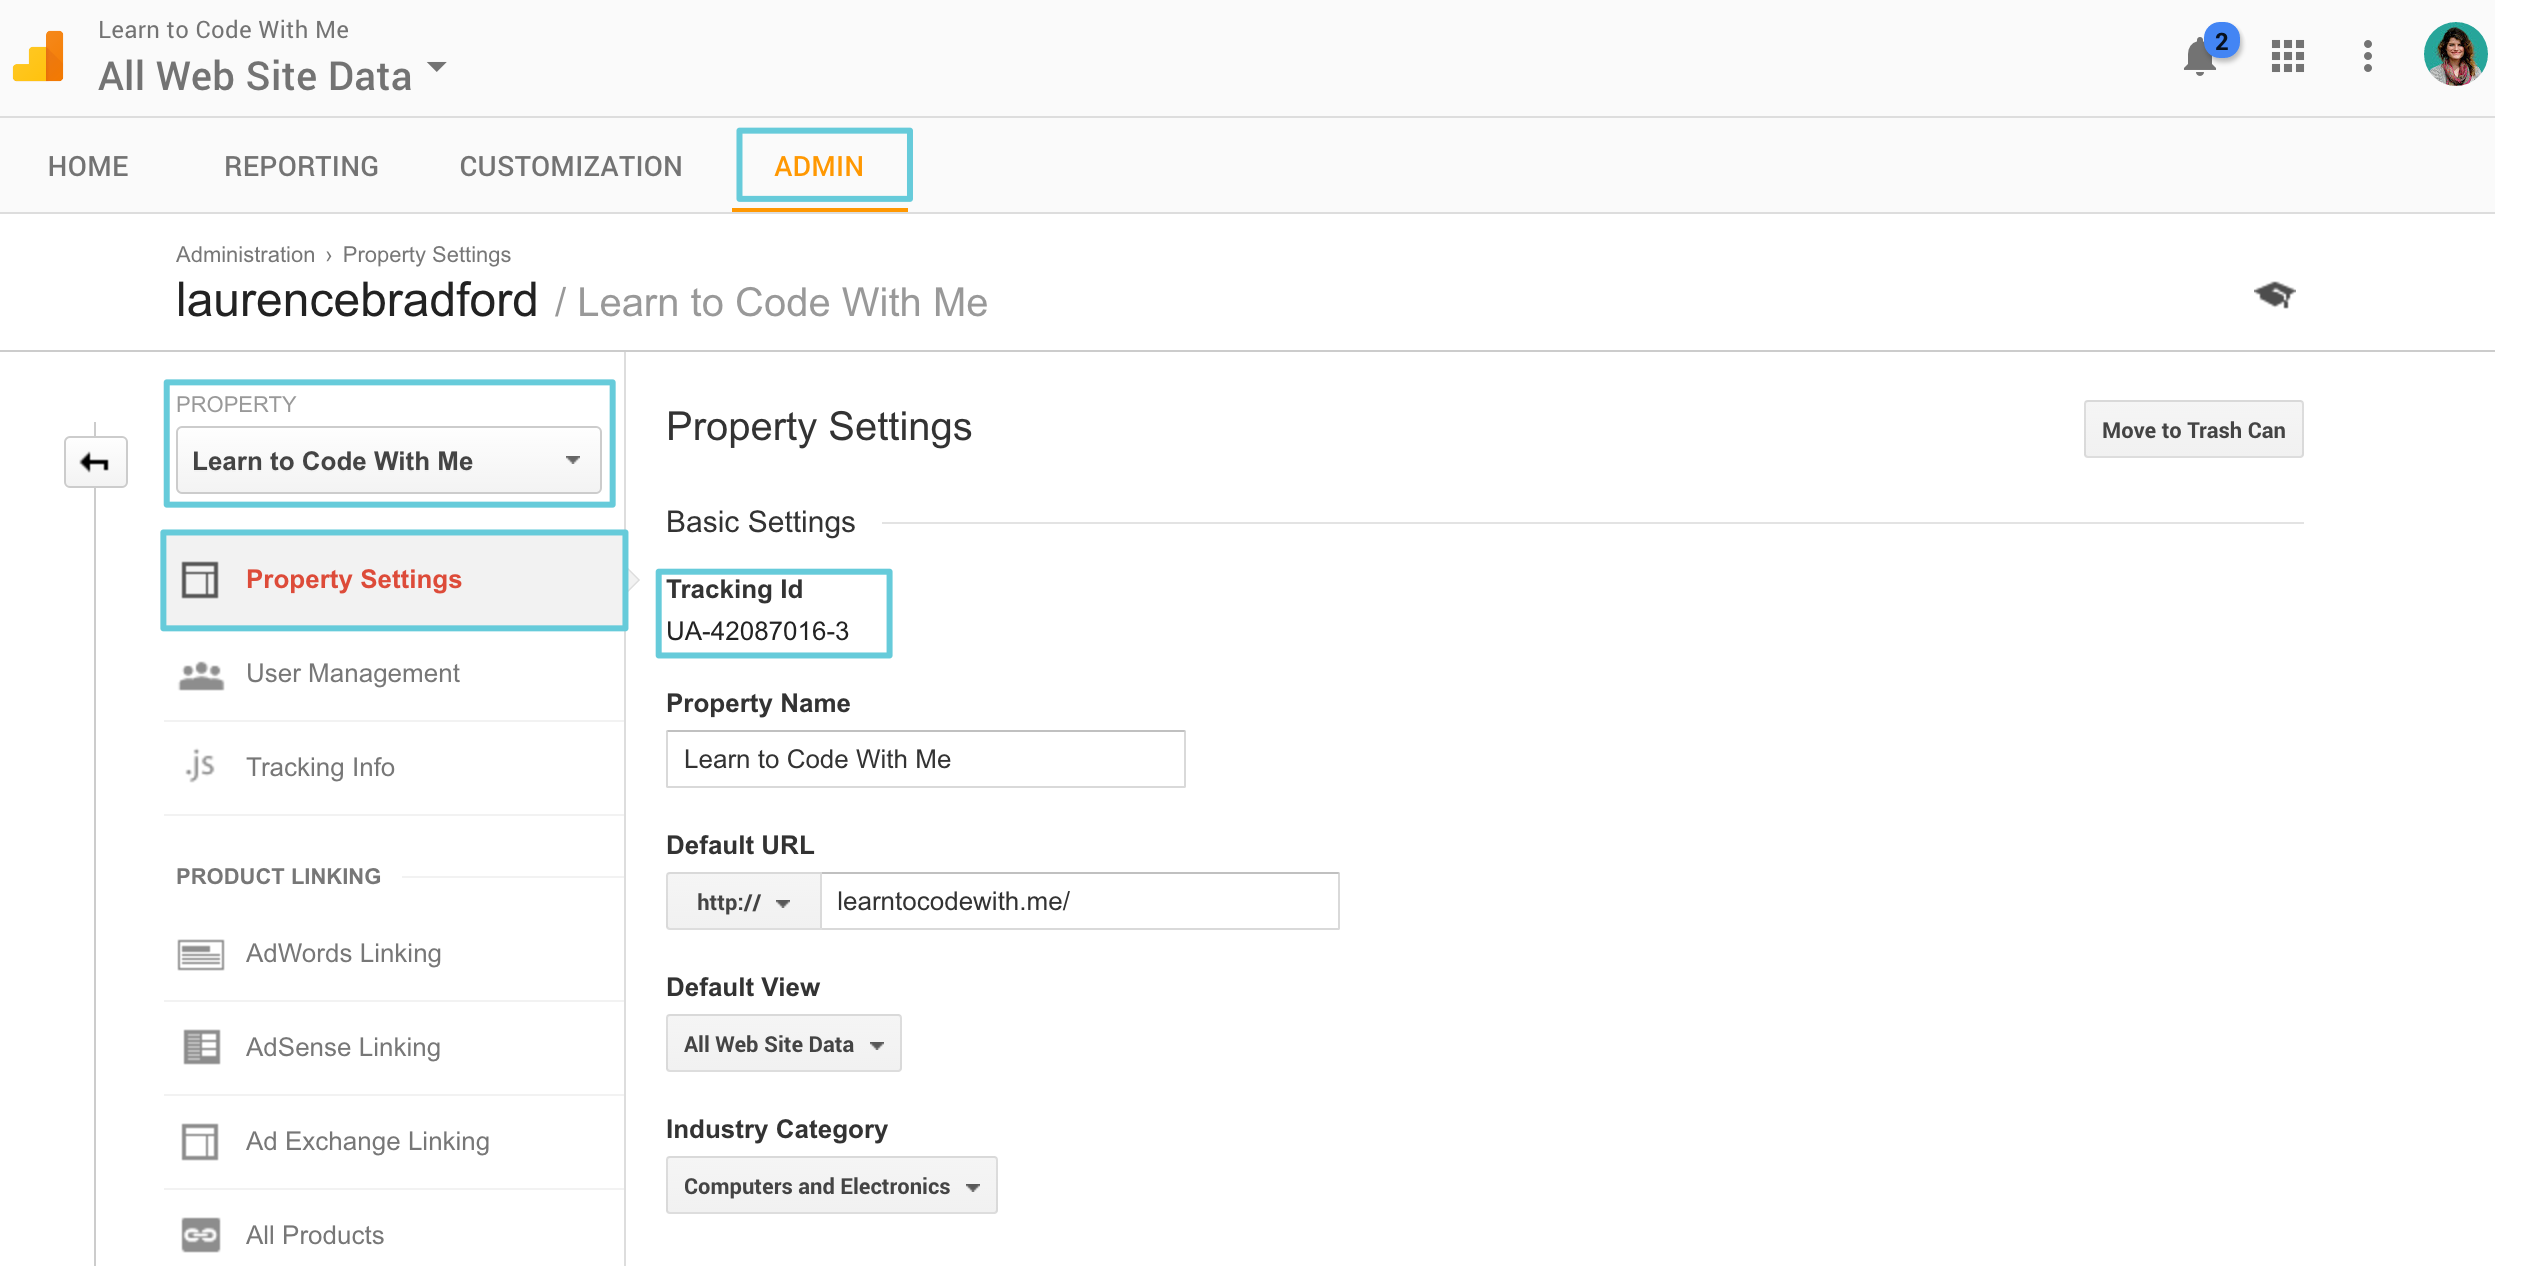 ga-tracking-id-property-settings